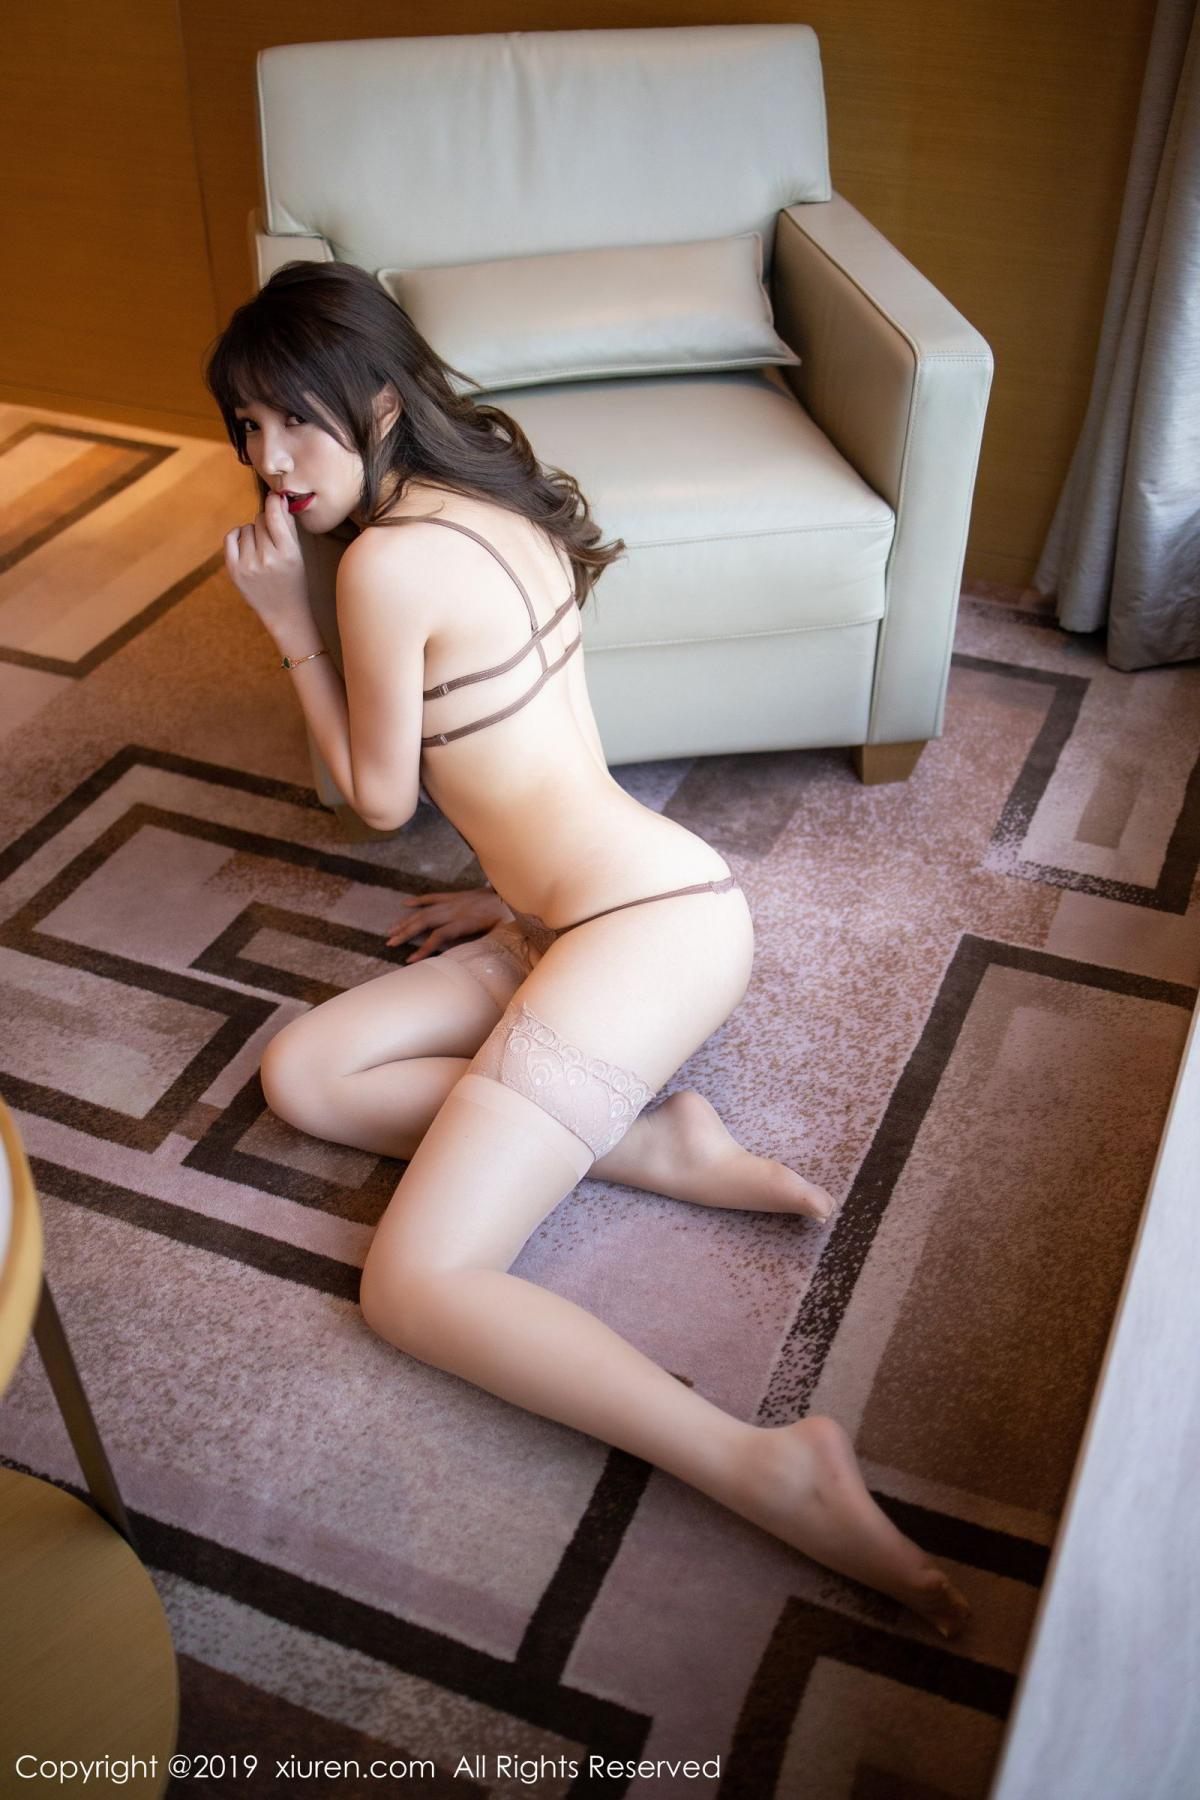 [XiuRen] Vol.1675 Chen Zhi 54P, Chen Zhi, Cheongsam, Tall, Underwear, Xiuren